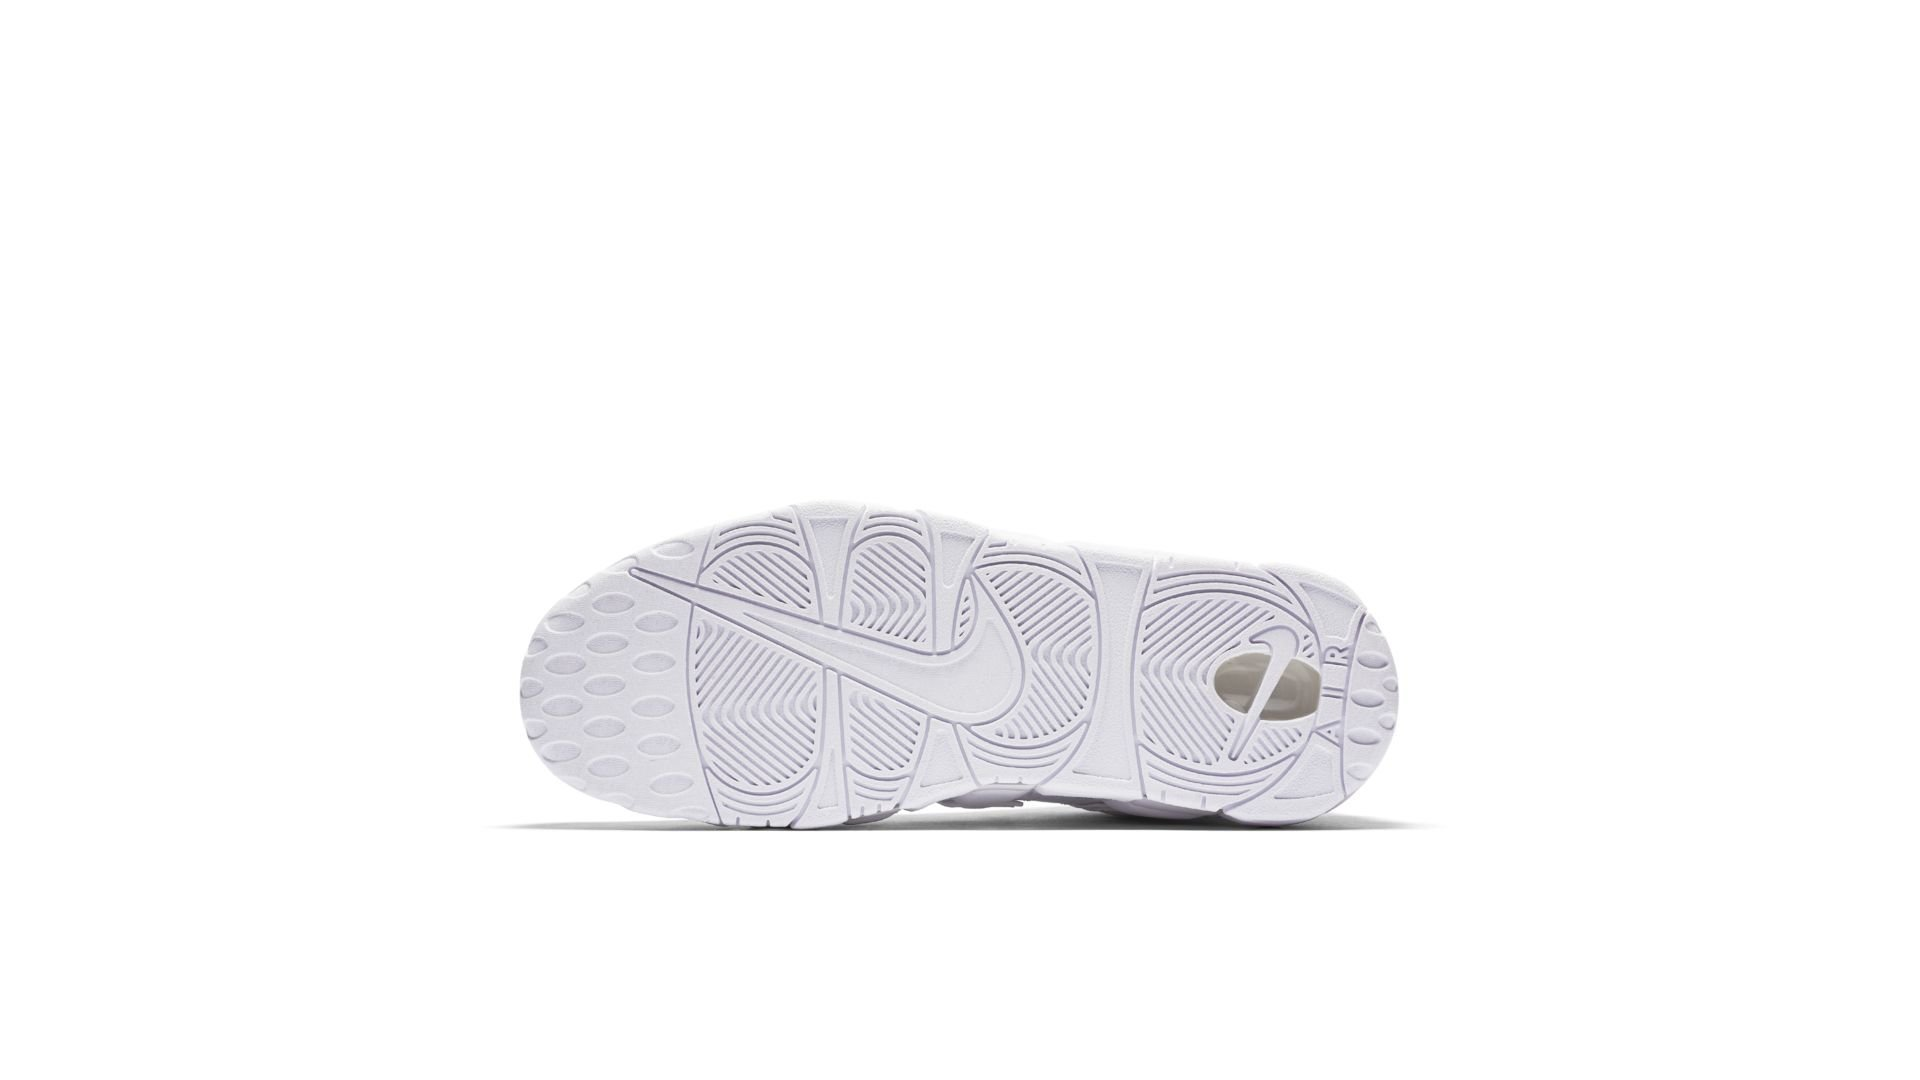 Nike Air More Uptempo 'Triple White' (921948-100)